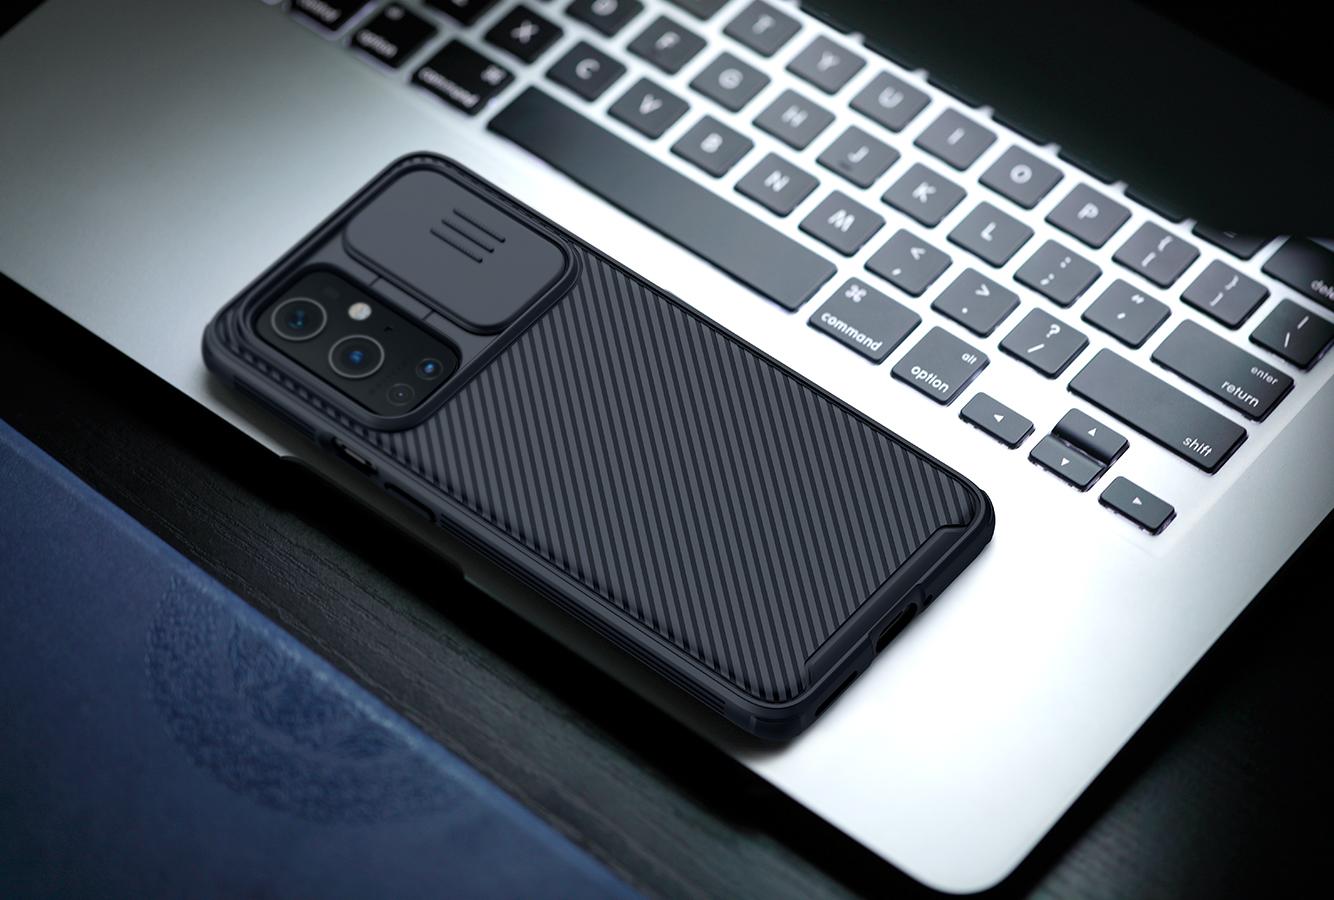 OnePlus_9_Pro_CamShield_Pro_Case-10.jpg